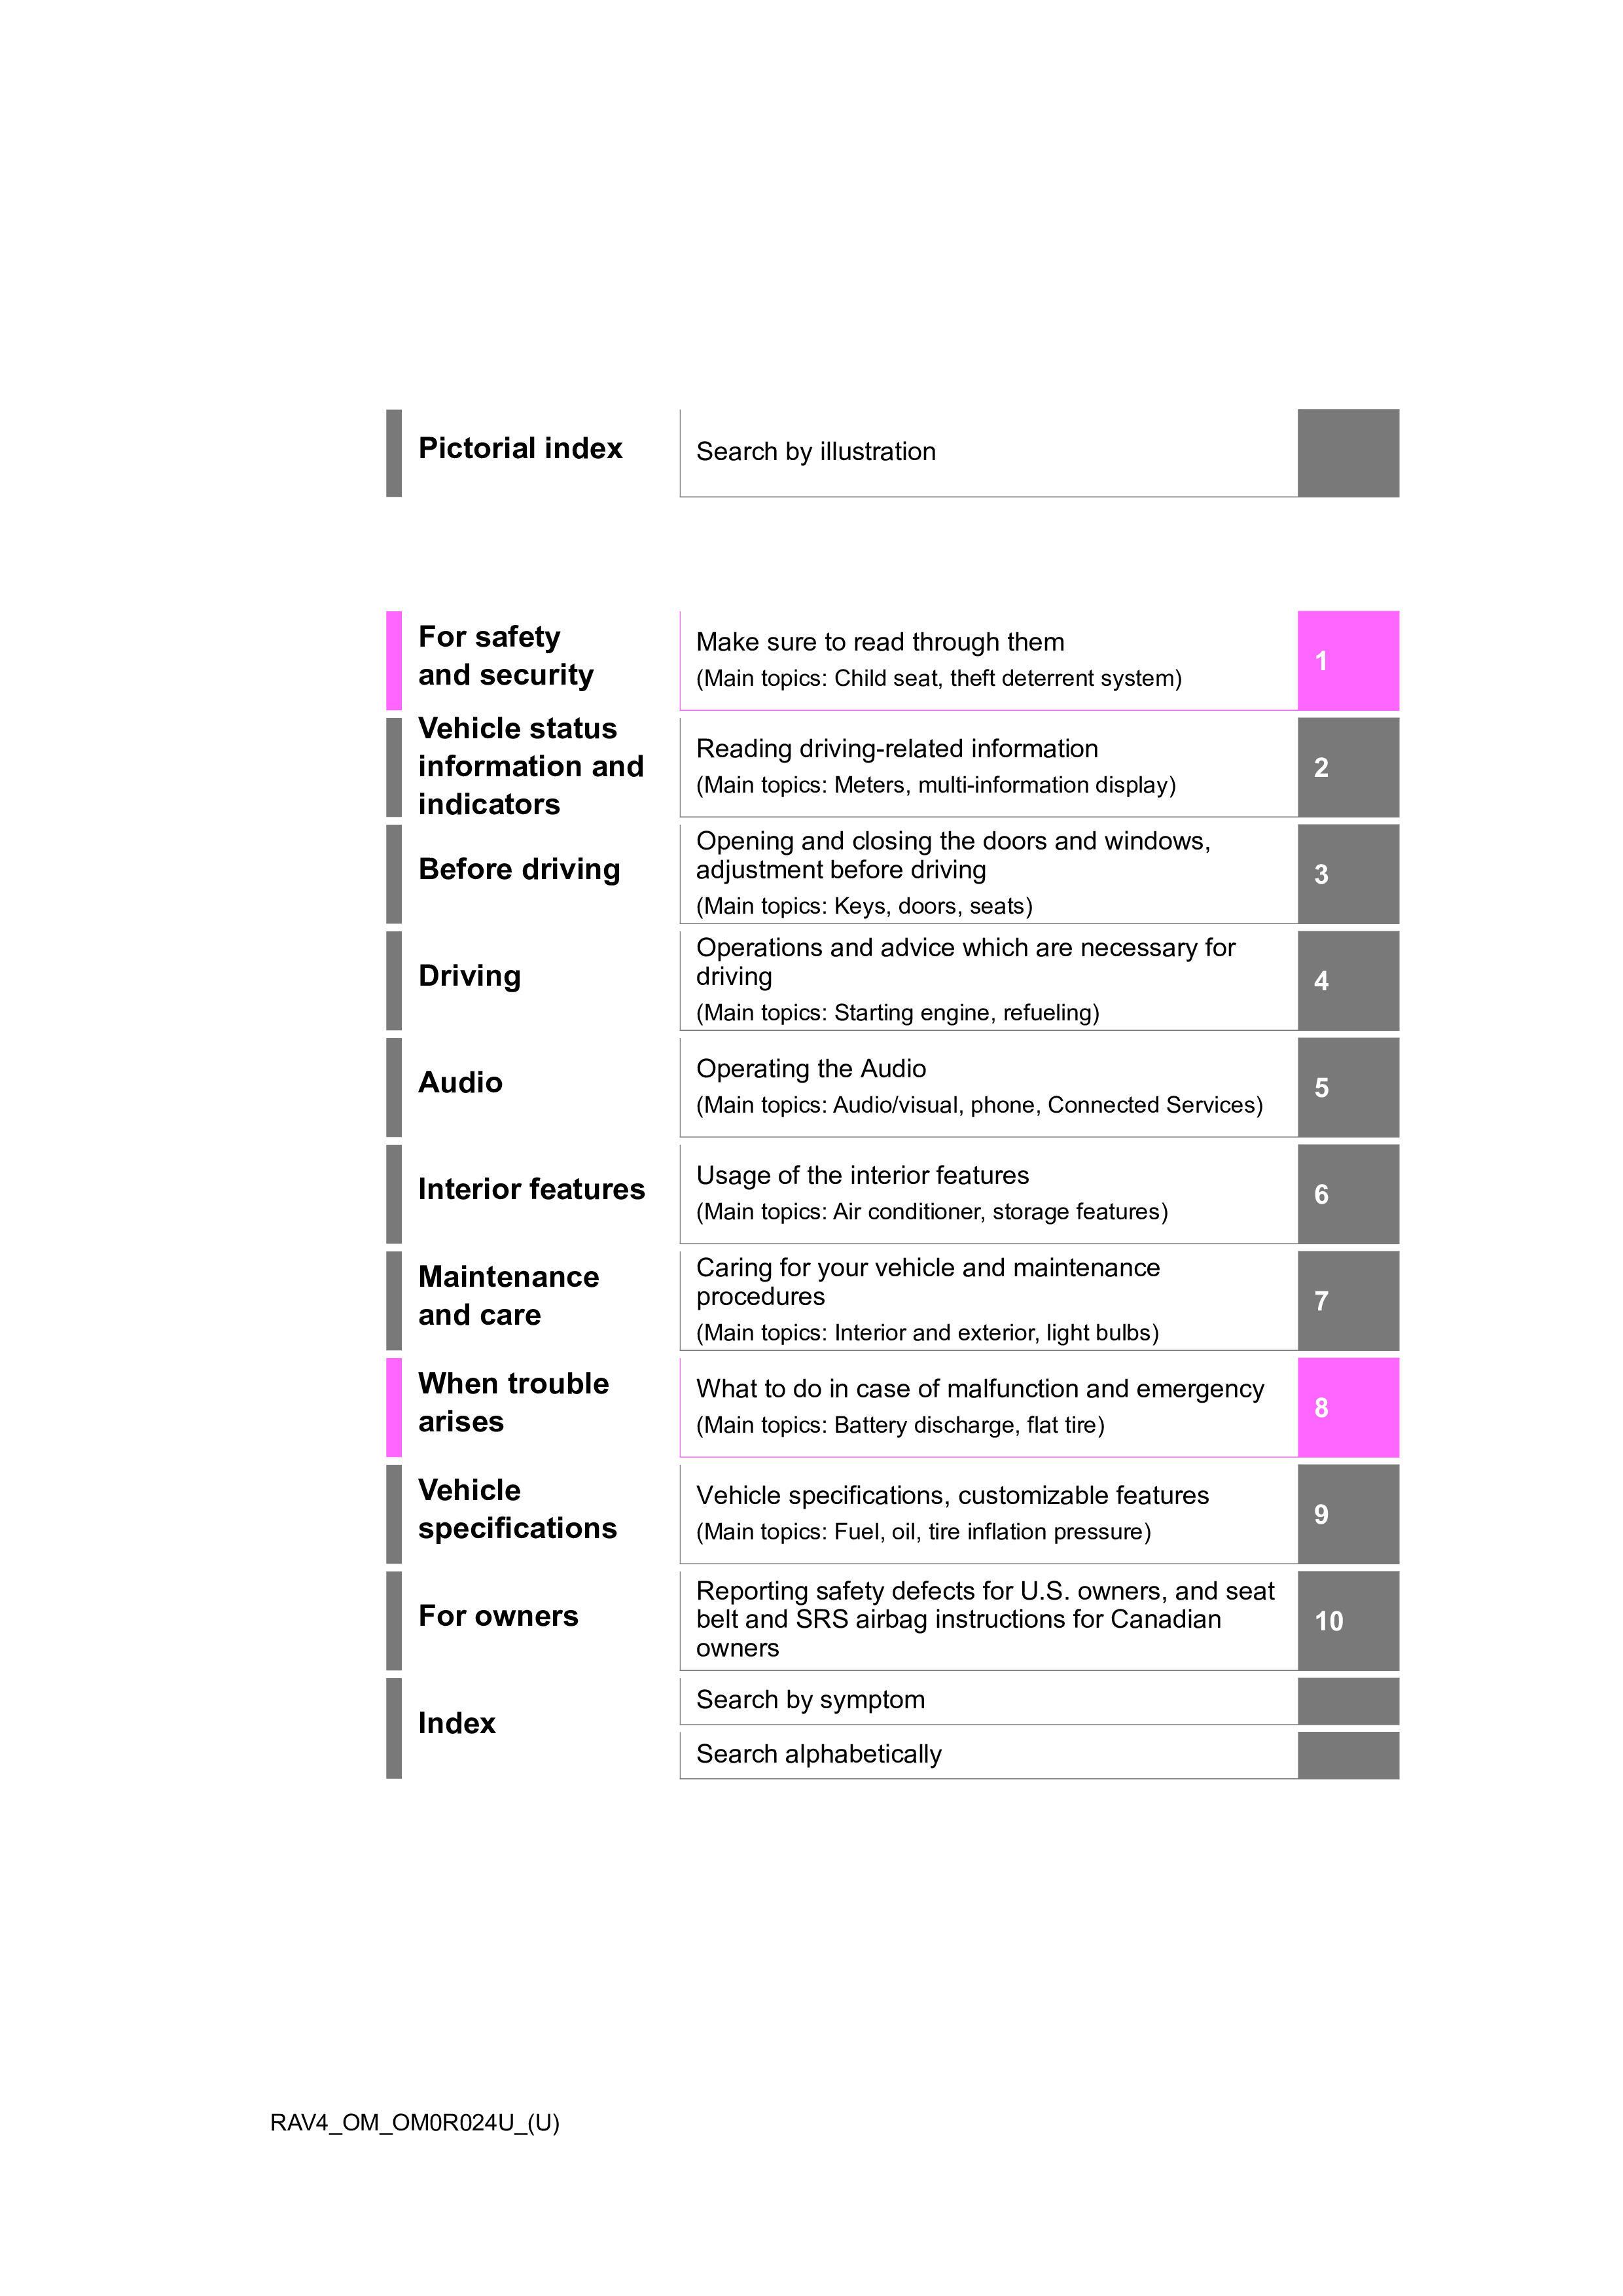 2020 Toyota Rav4 owners manual